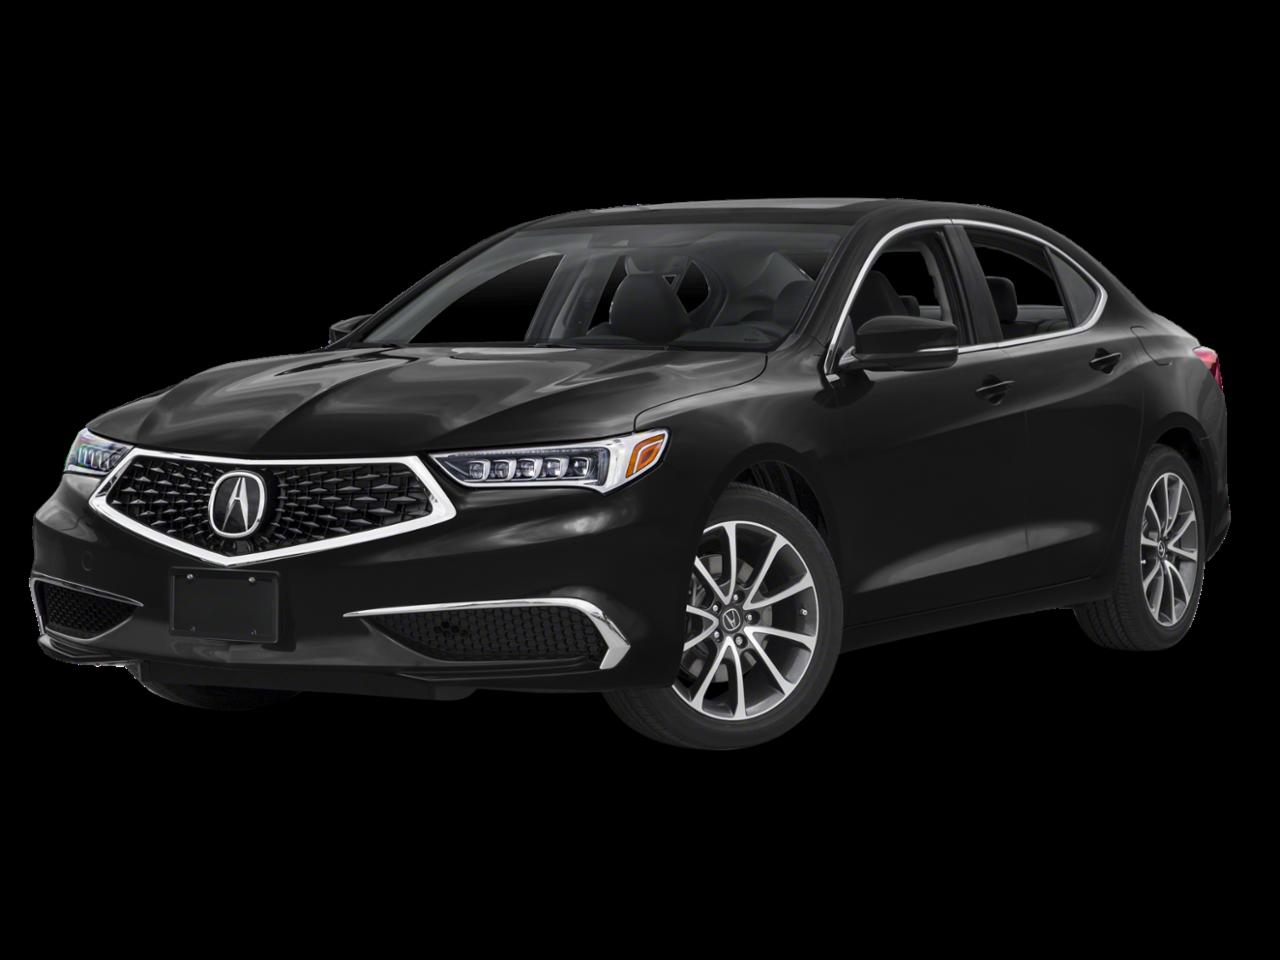 Acura 2020 TLX 3.5L FWD